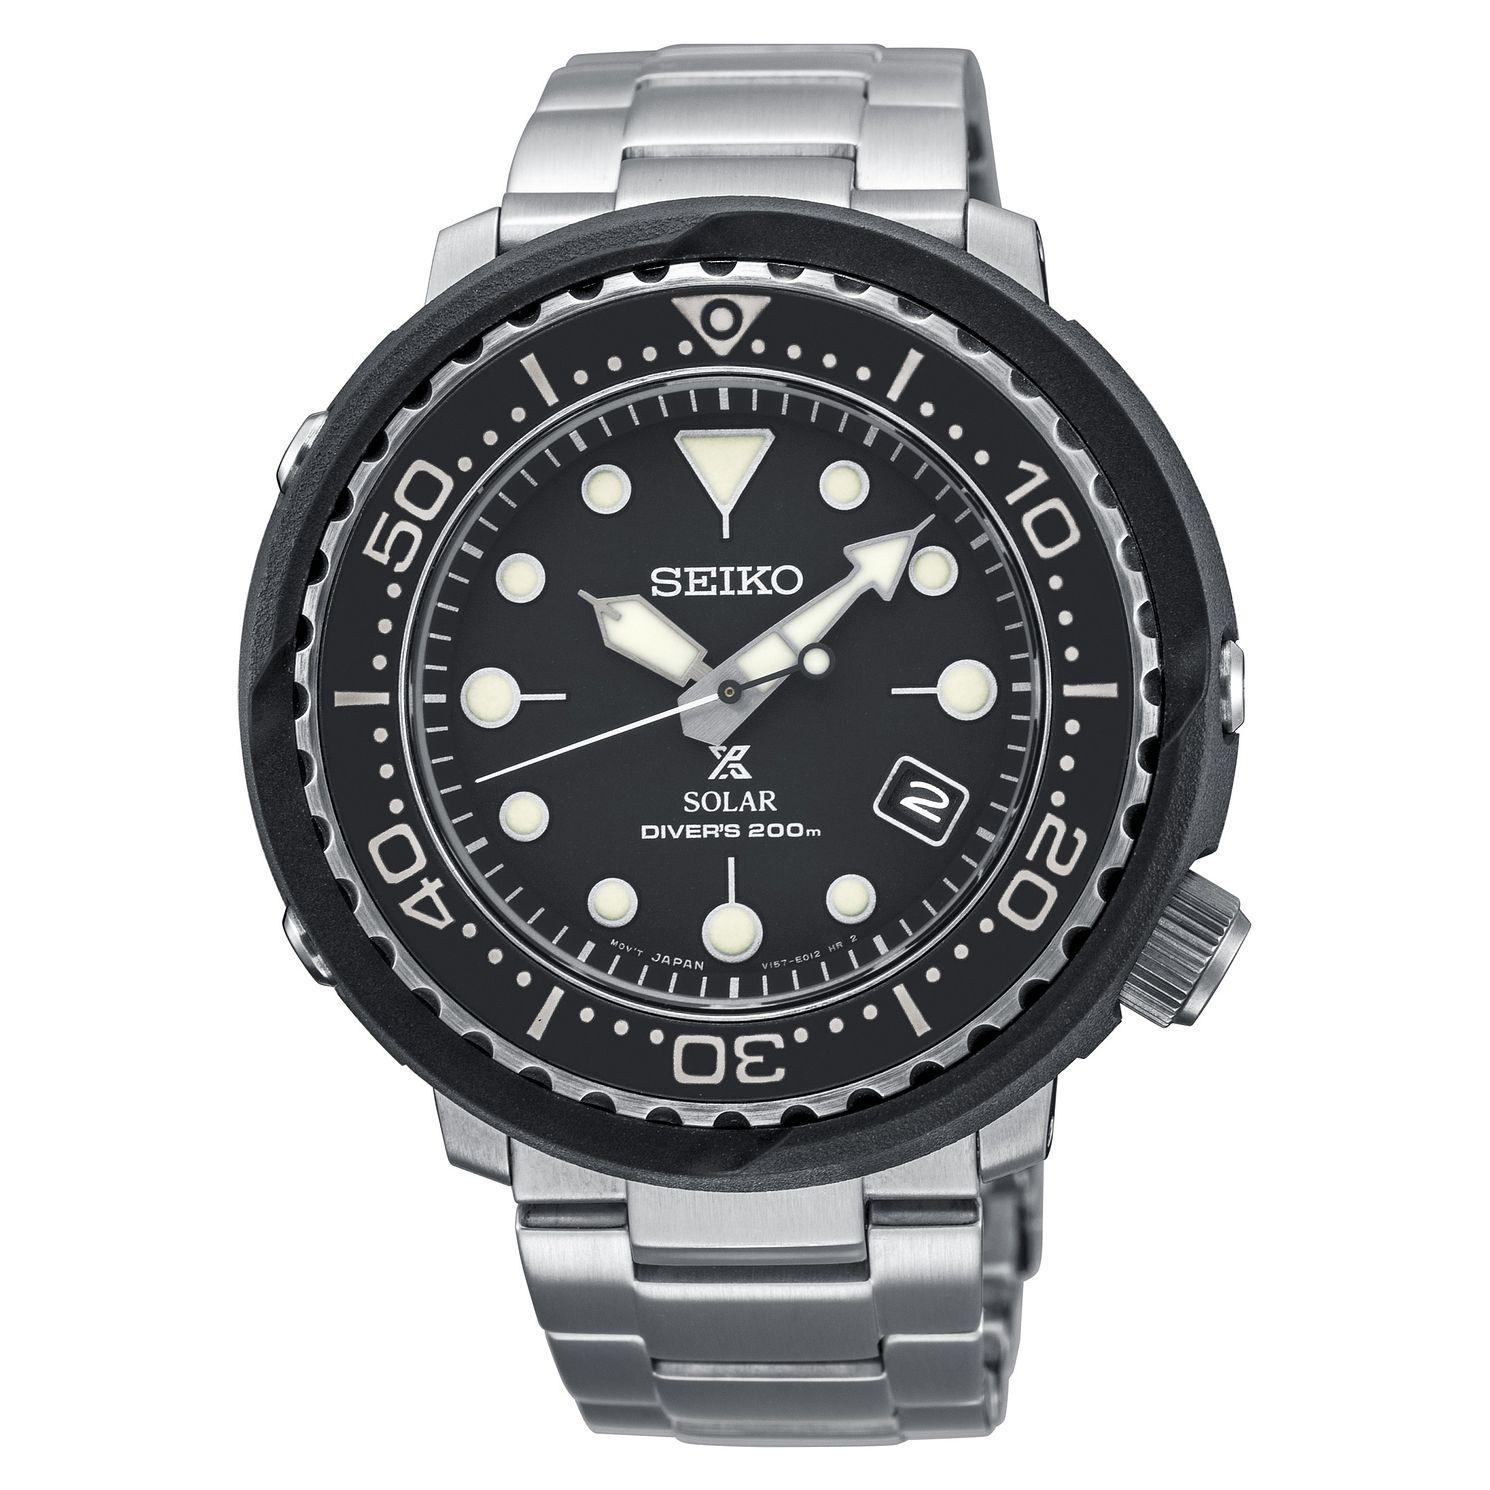 Seiko Prospex Solar Diver's Stainless-Steel Bracelet Watch, £216.75 at Ernest Jones